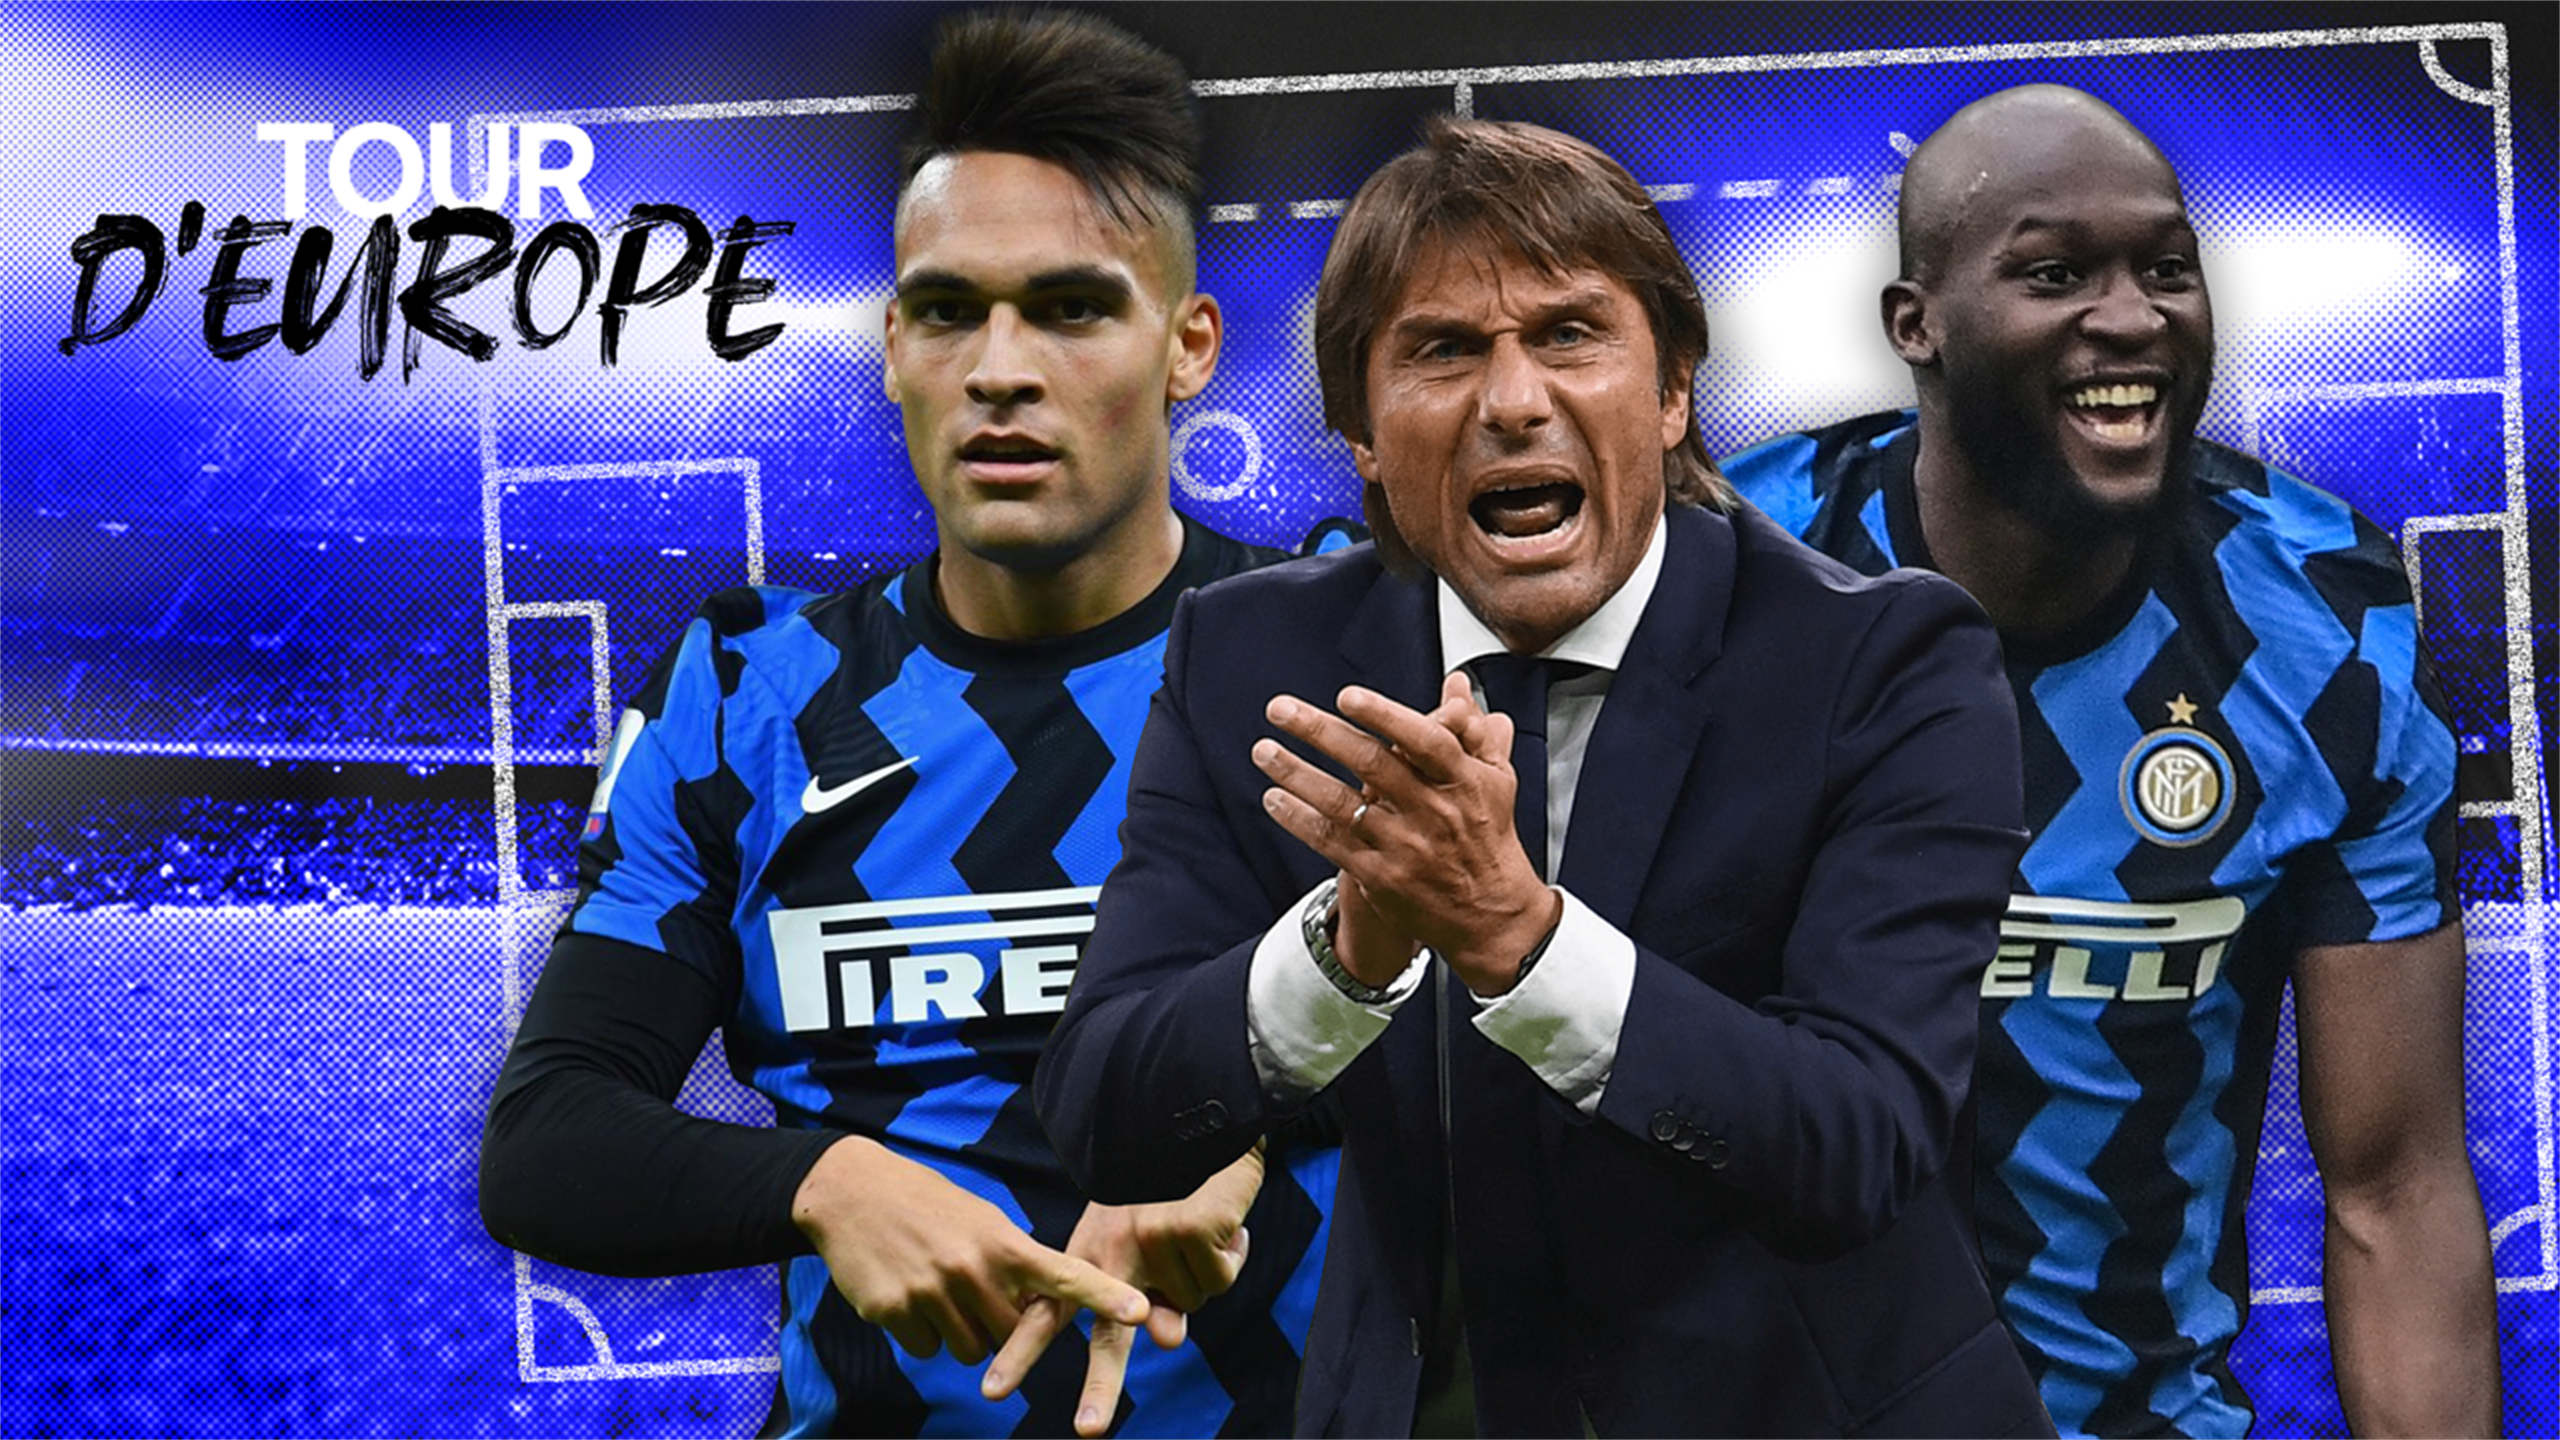 Inter Milan - Comment Antonio Conte a mis en orbite son duo Lukaku-Lautaro vers le titre - Eurosport FR